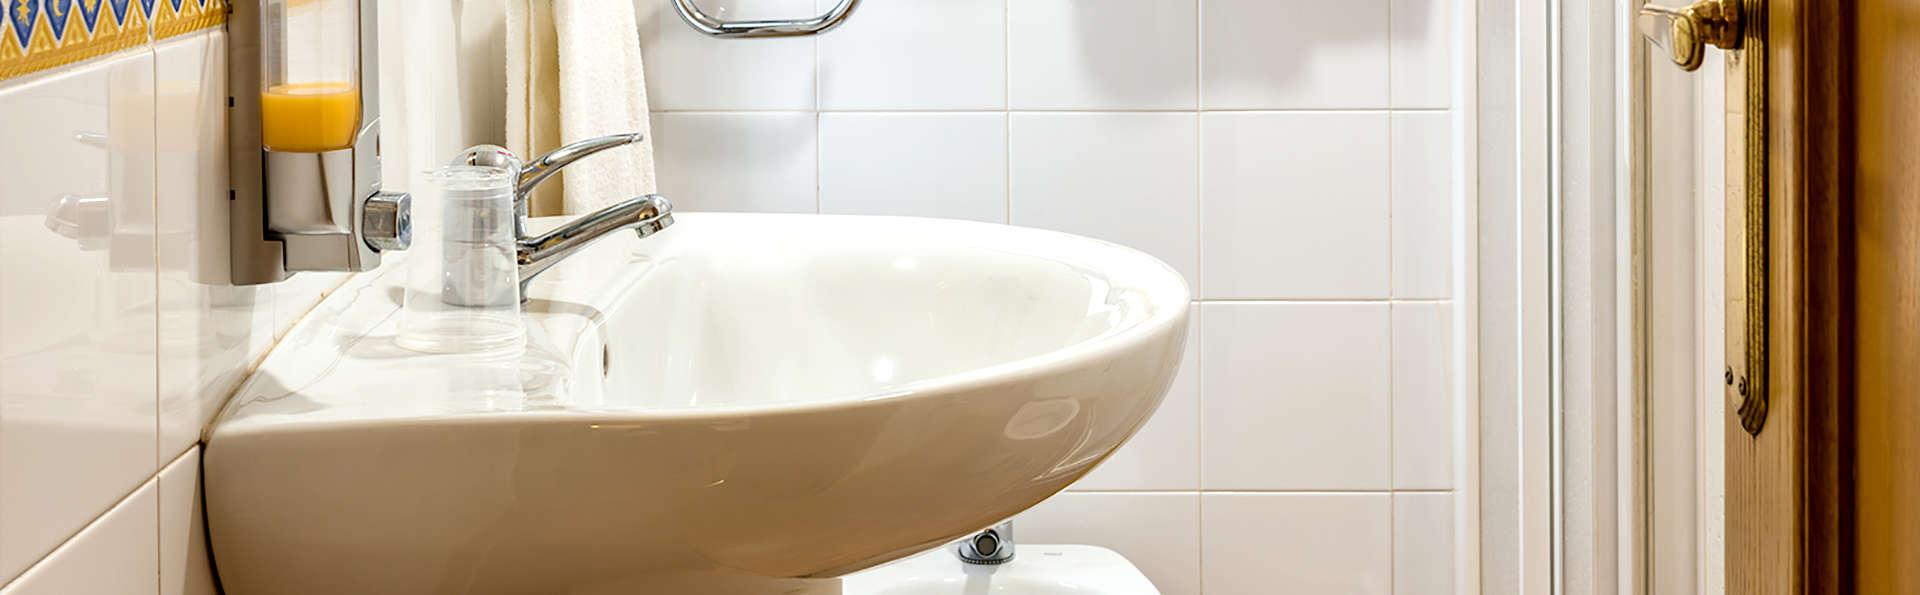 Kubik Hotel - Edit_Bathroom.jpg